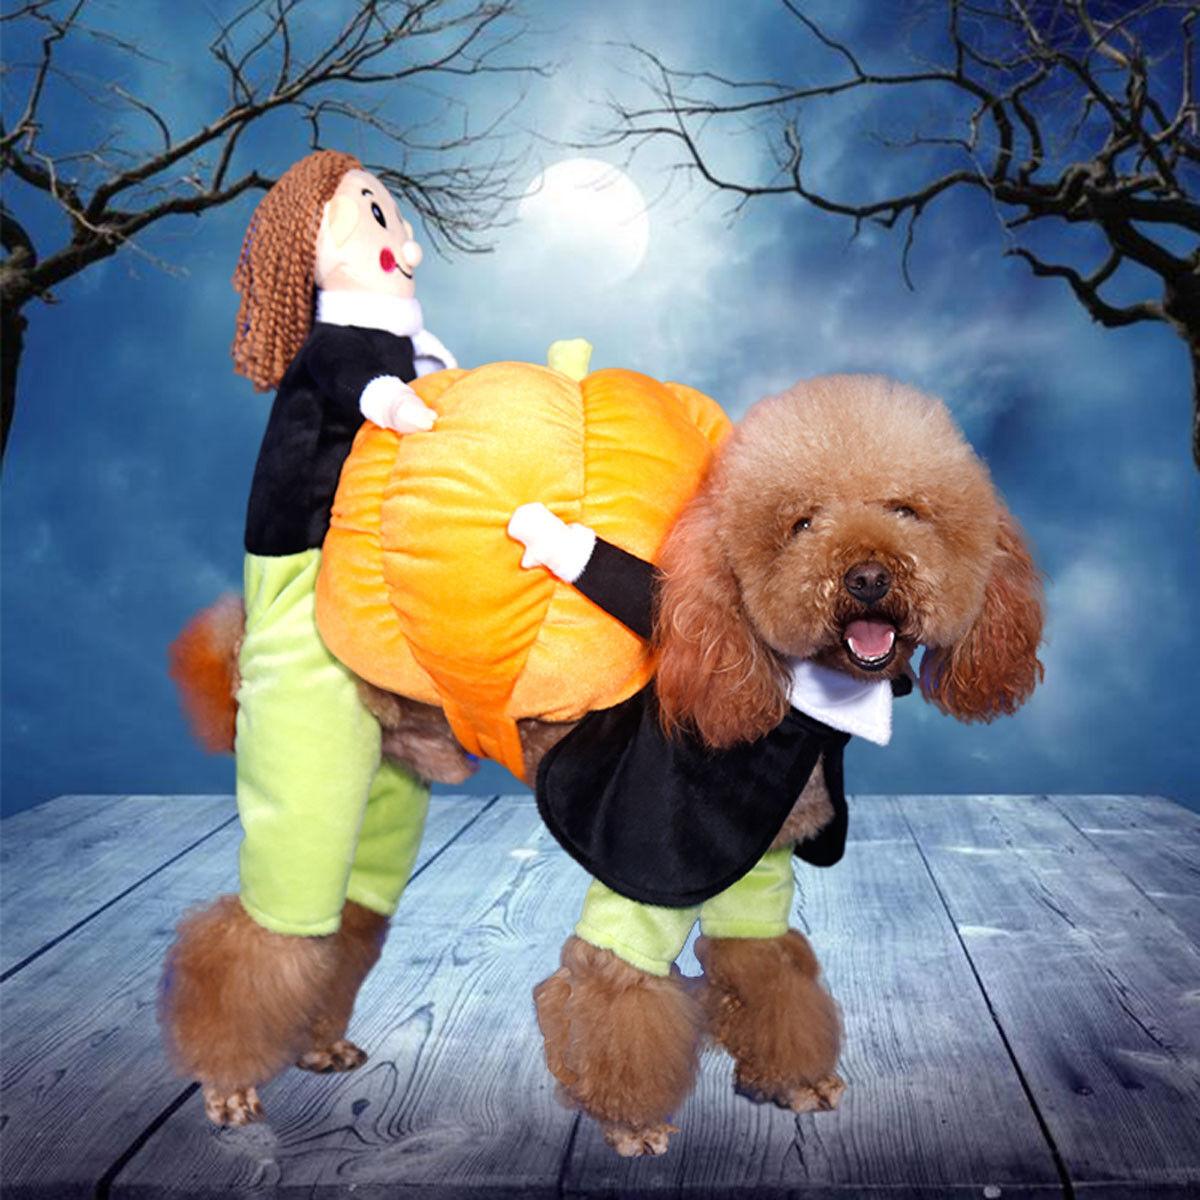 Dog Carry Pumpkin Costume Halloween Cat Pet Fancy Puppy Apparel Jacket Clothes